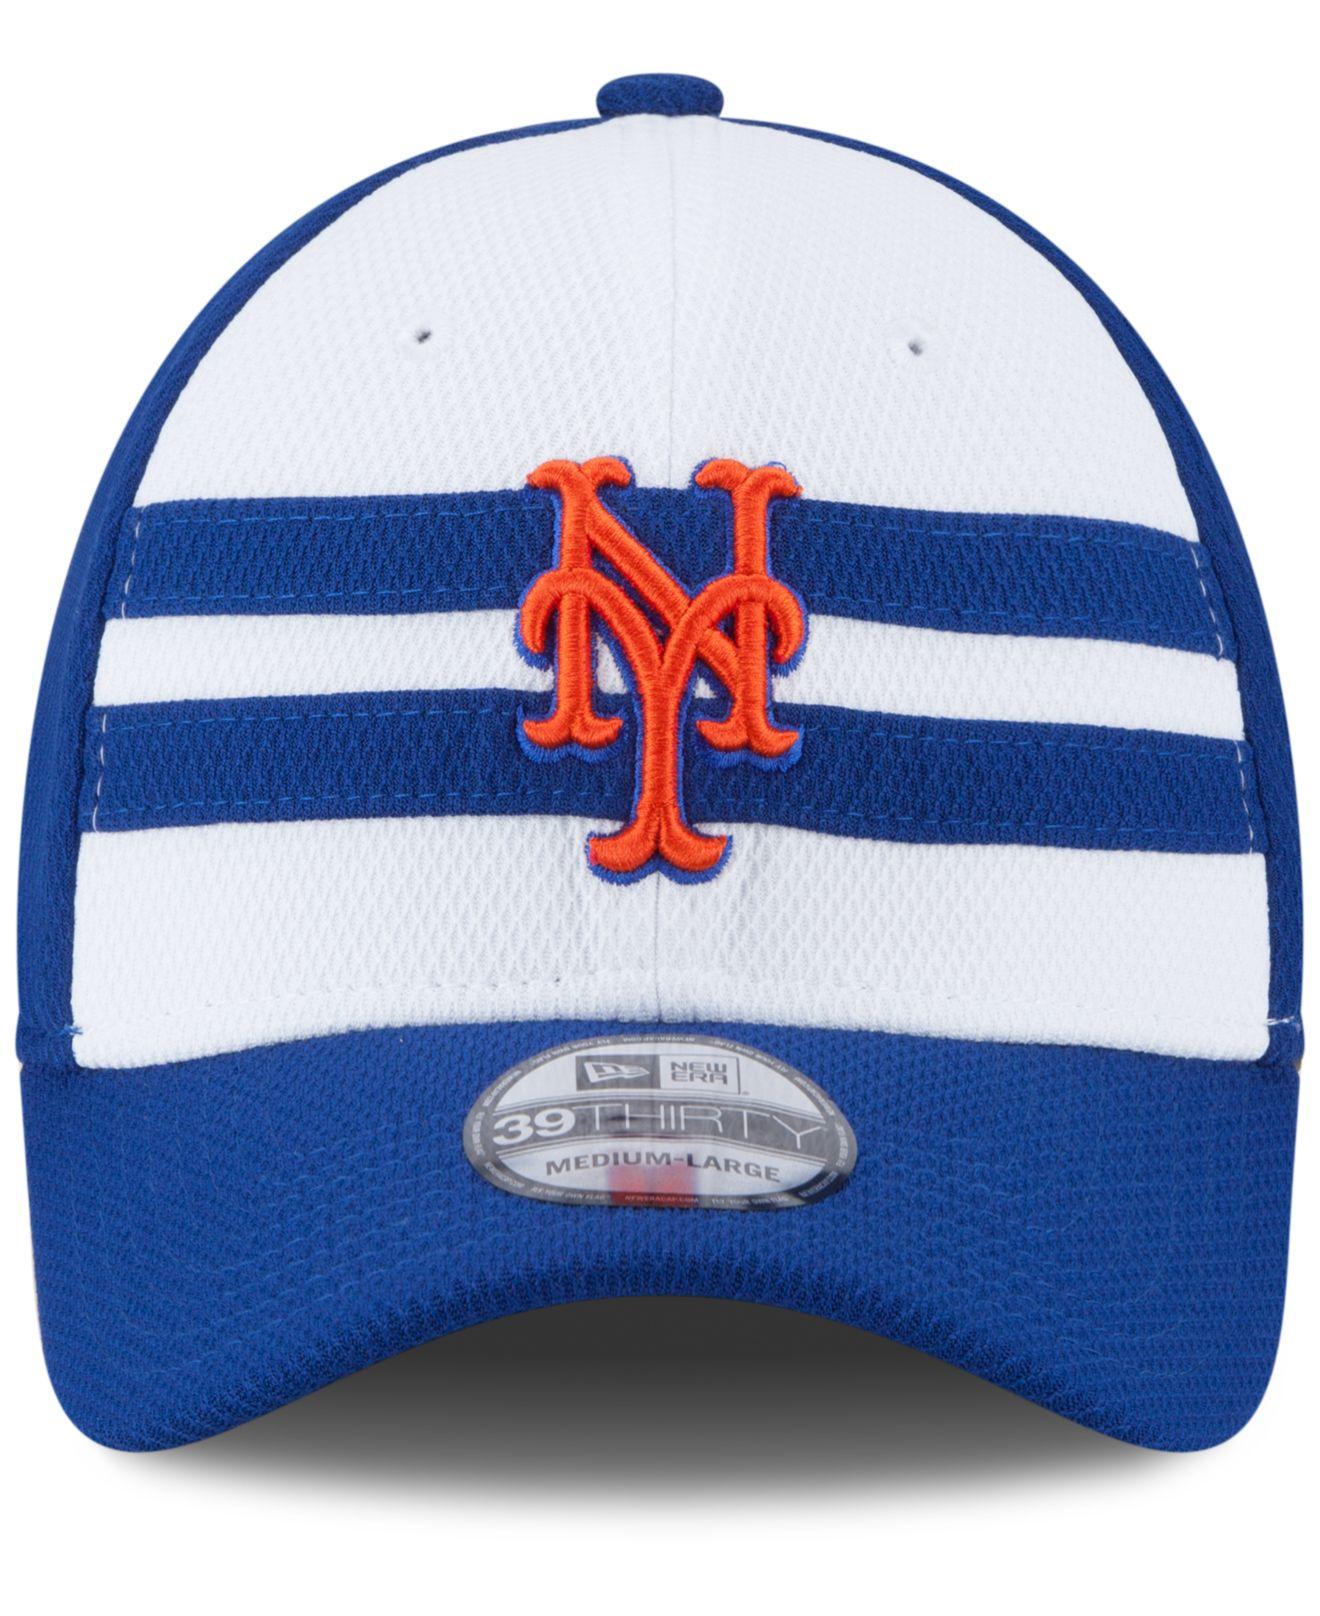 fda8061ca top quality new york mets beanie hat guys ab810 85d3f